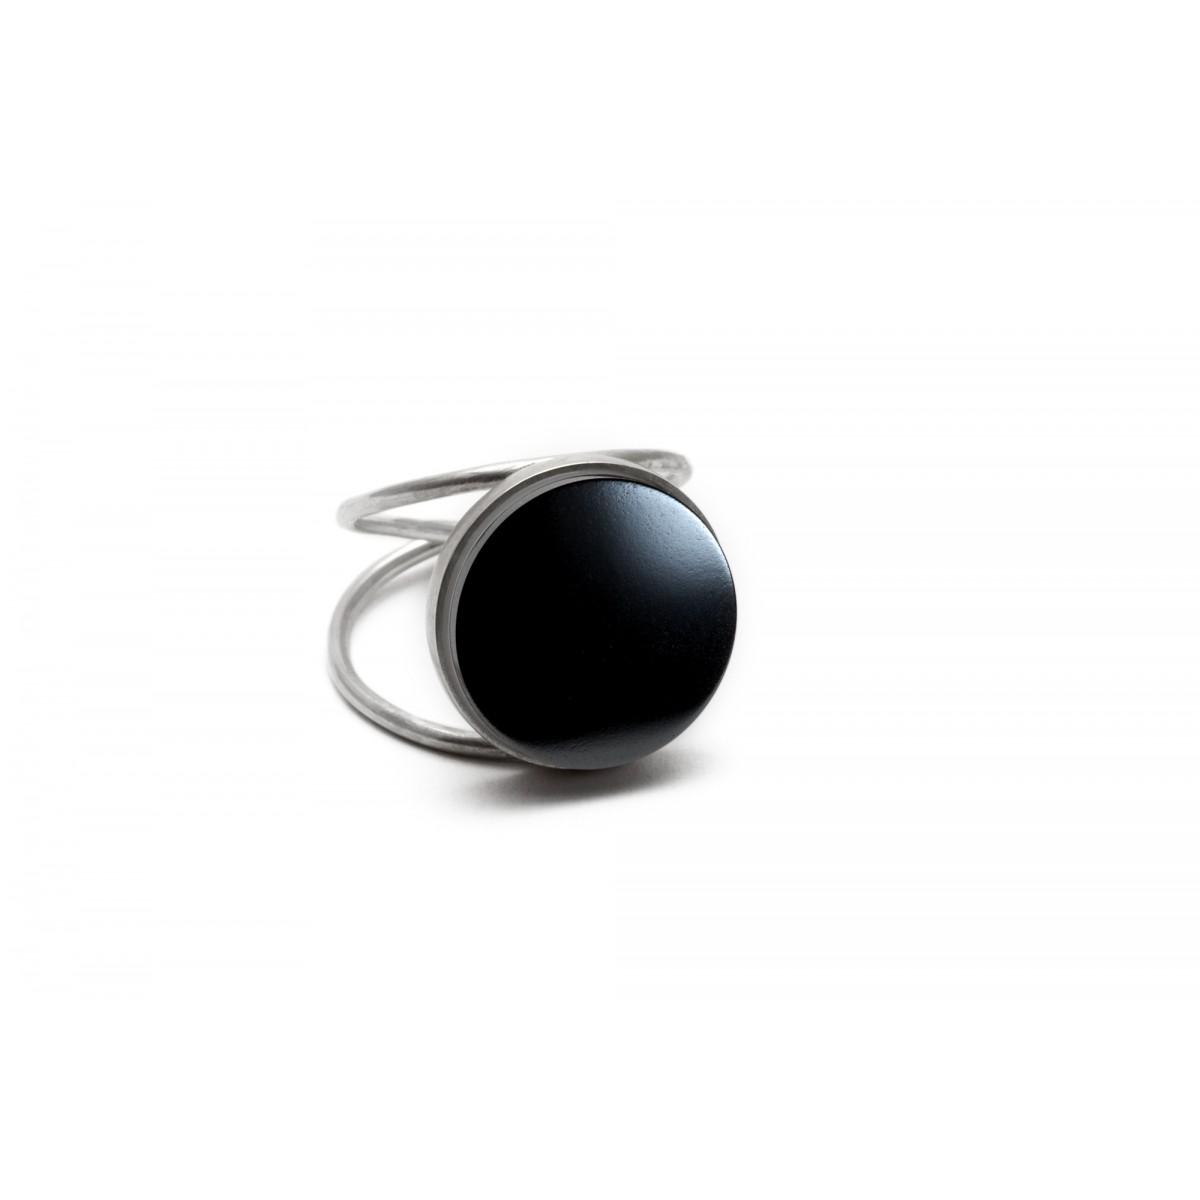 "Eva Slotta Jewellery ""Tint Deep"" Ring mit schwarzem Hämatit, 925 Silber"